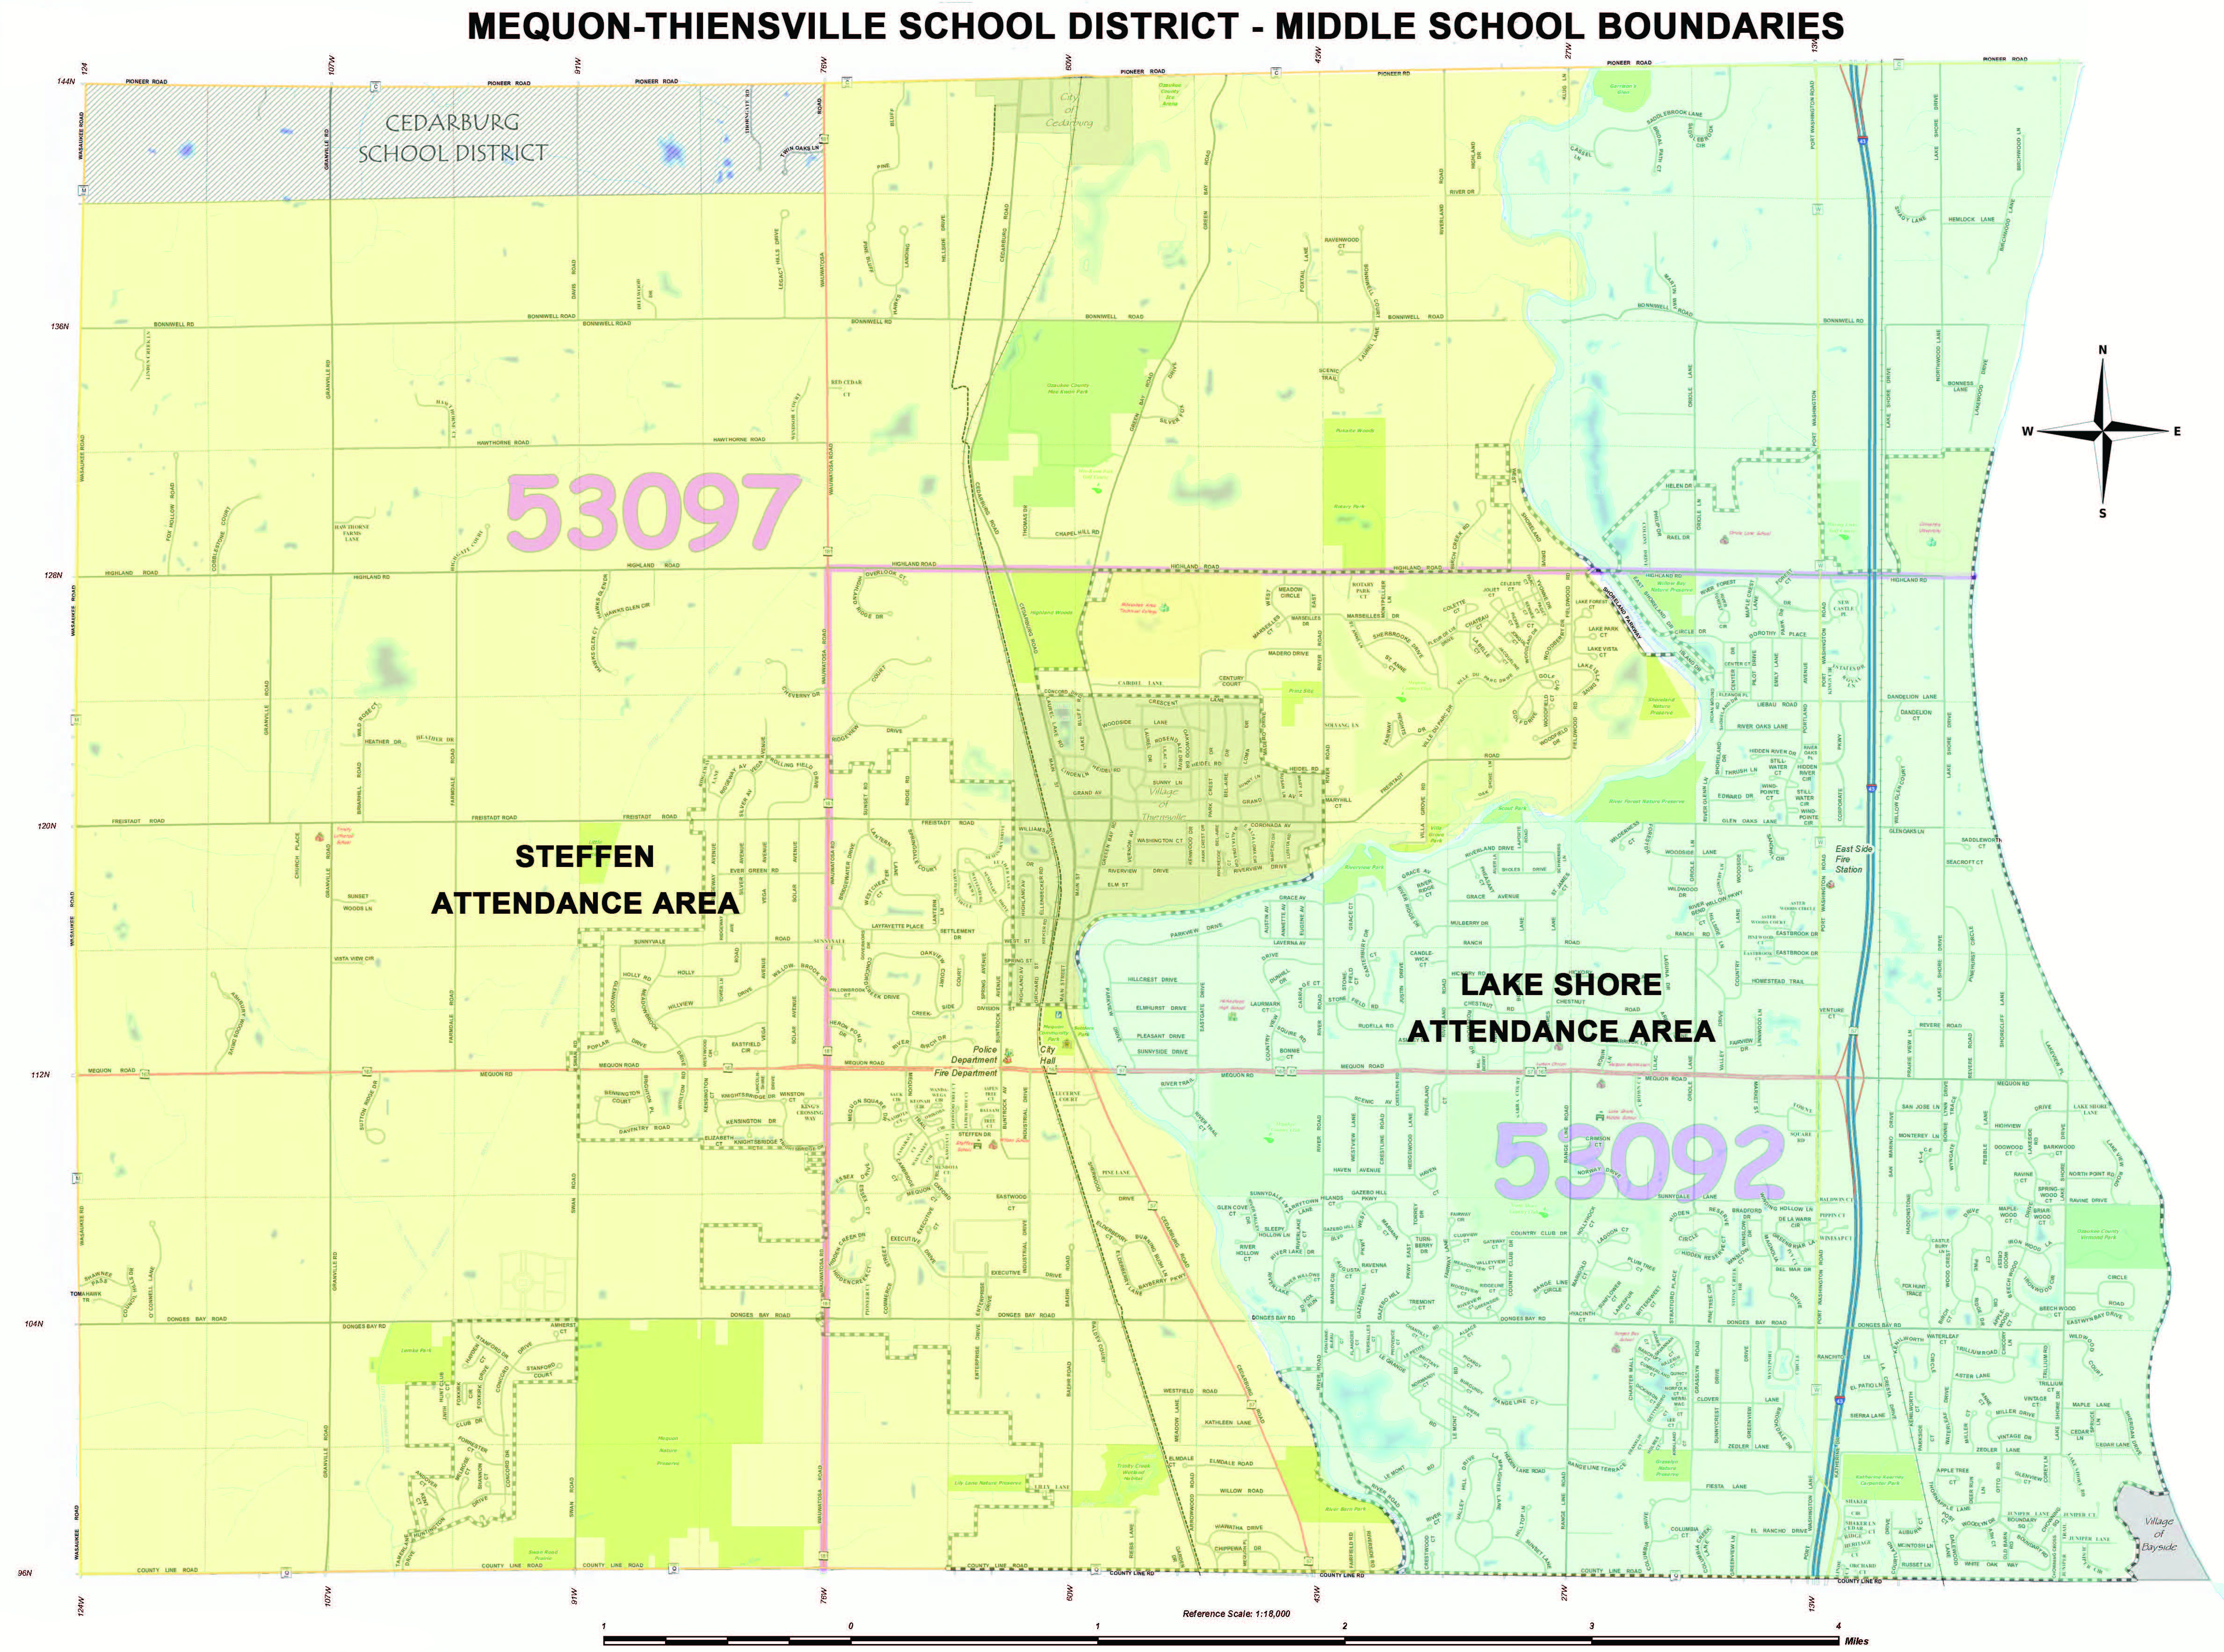 Homestead High School Campus Map.Attendance Maps Mequon Thiensville School District